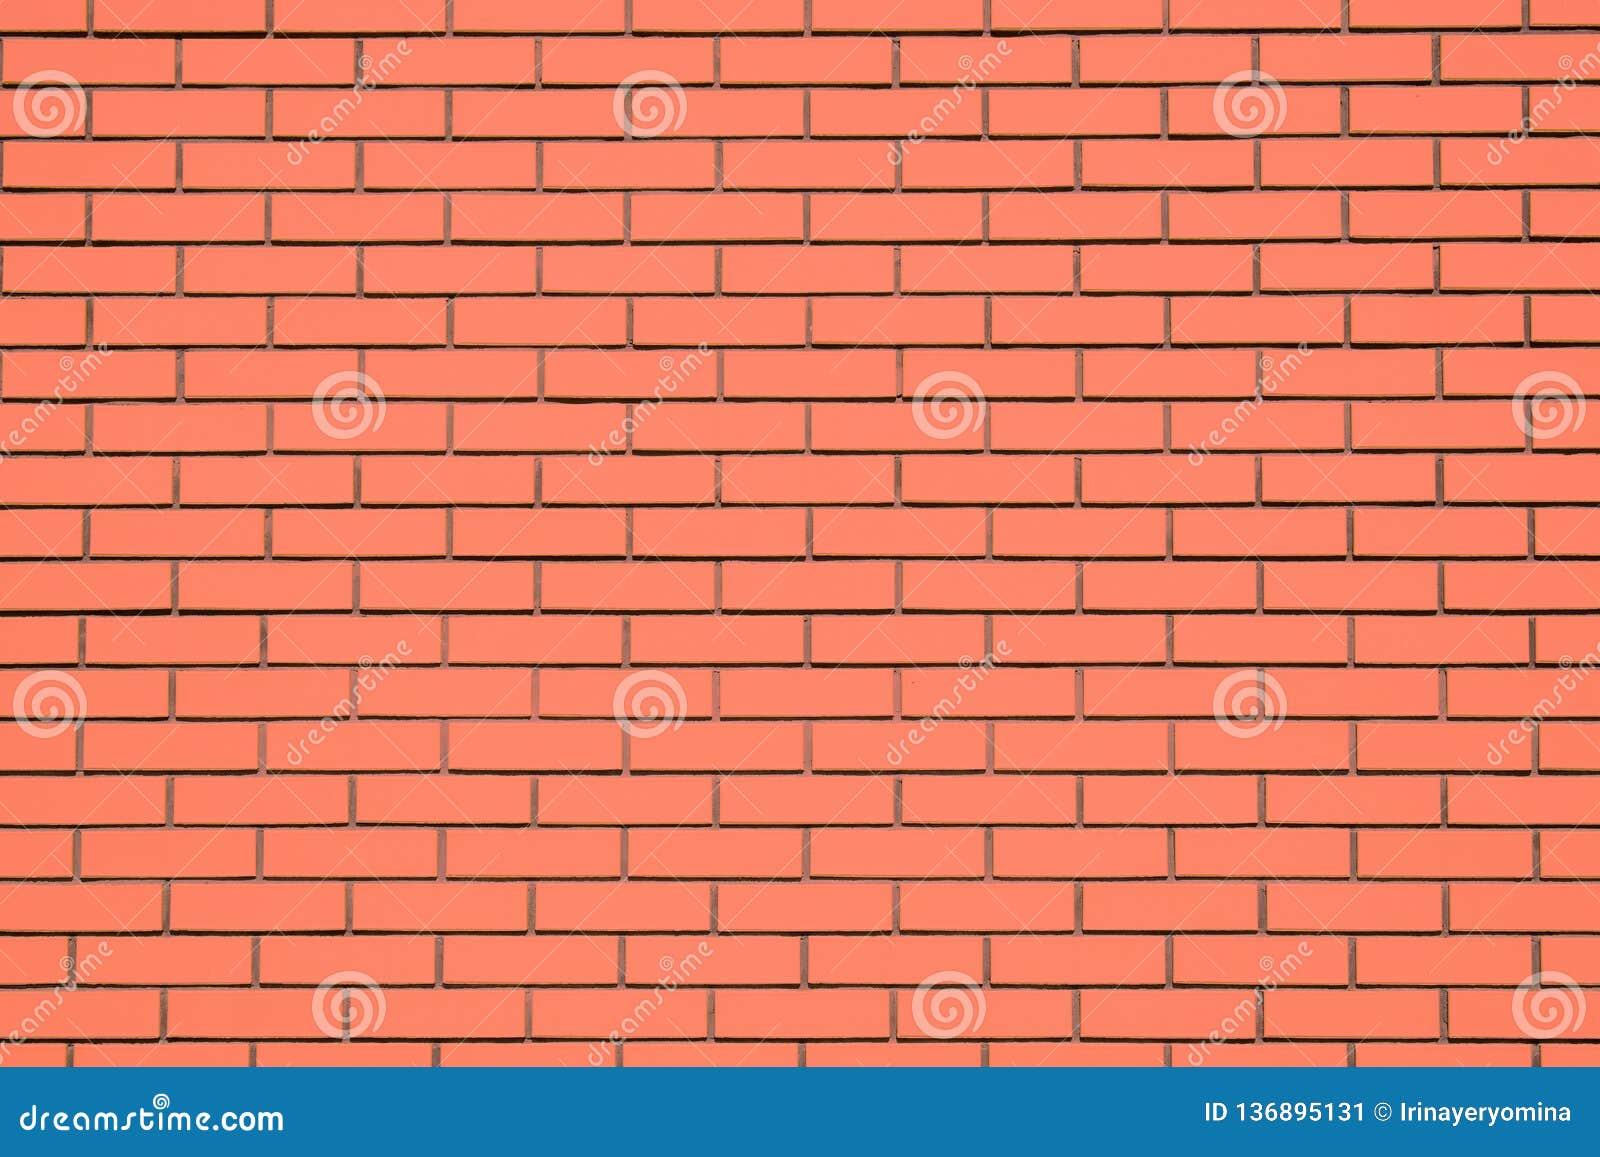 Coral brick wall background. Living Coral textural brick wall, color